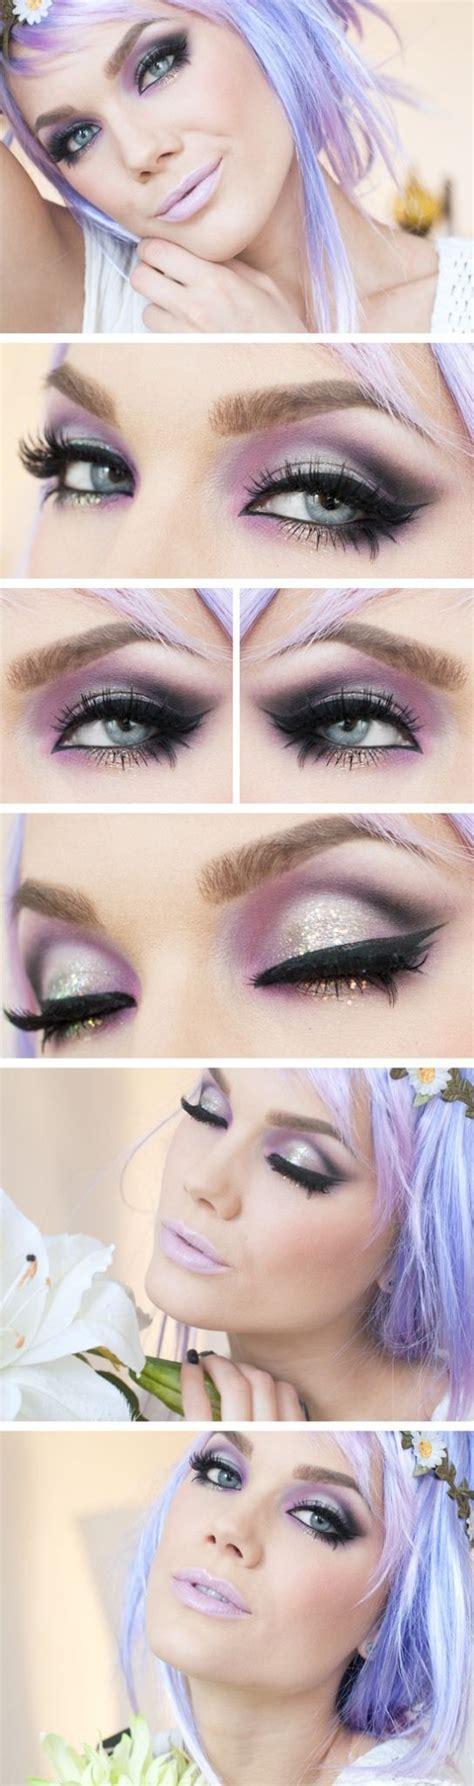 Eyeshadow Viva Seri D beautiful eye shadow and a pretty pale lilac lip it